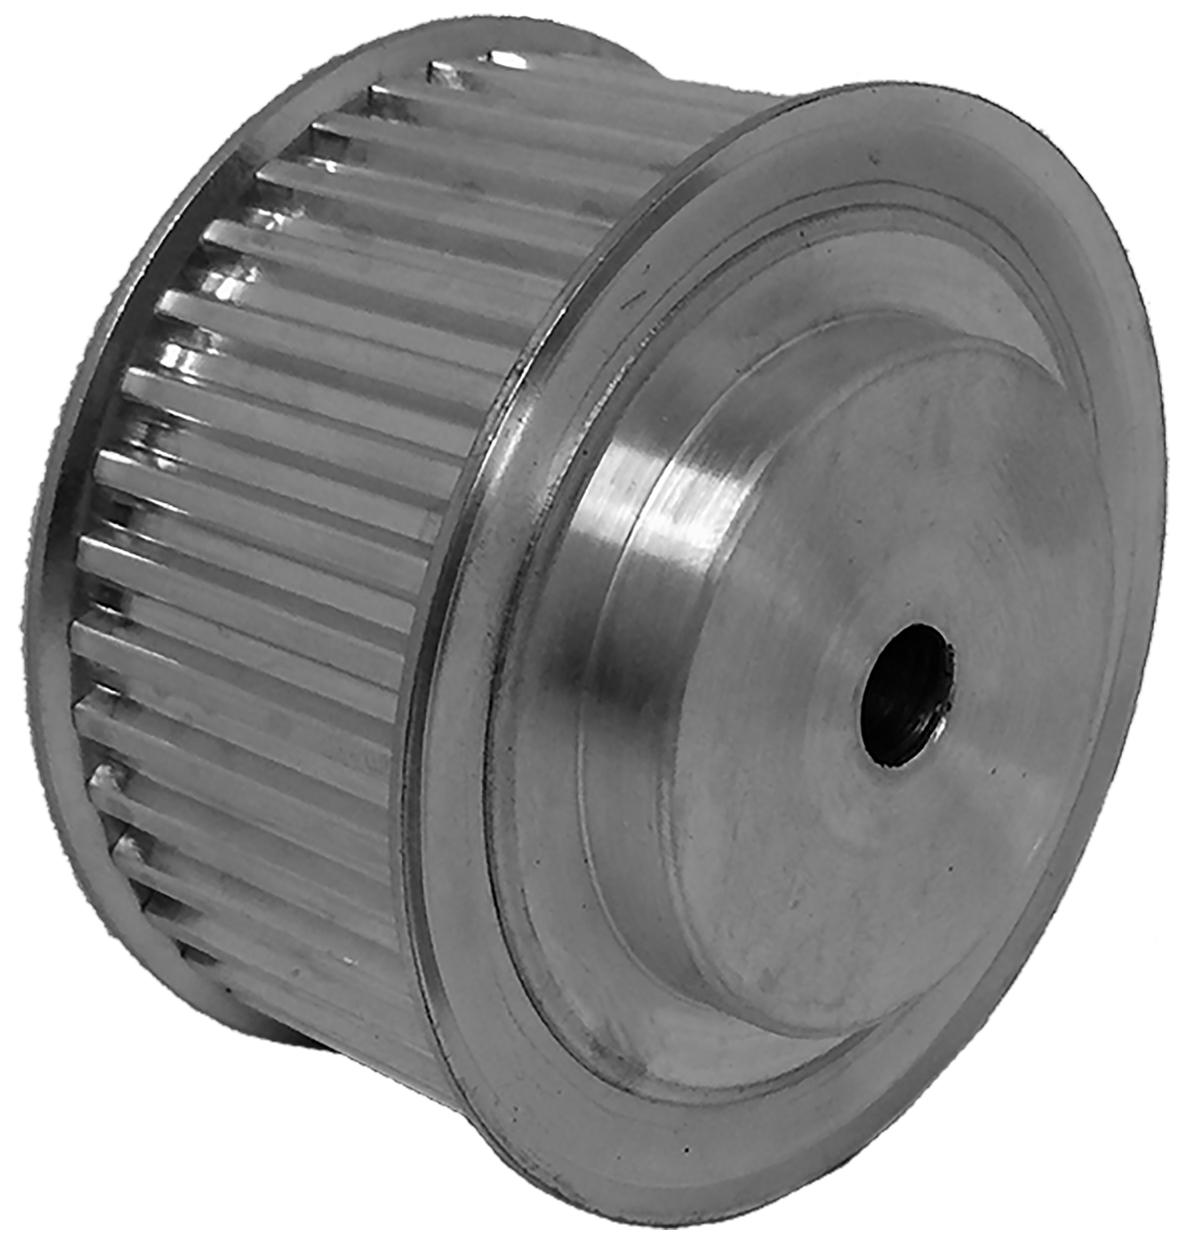 36T5/40-2 - Aluminum Metric Pulleys